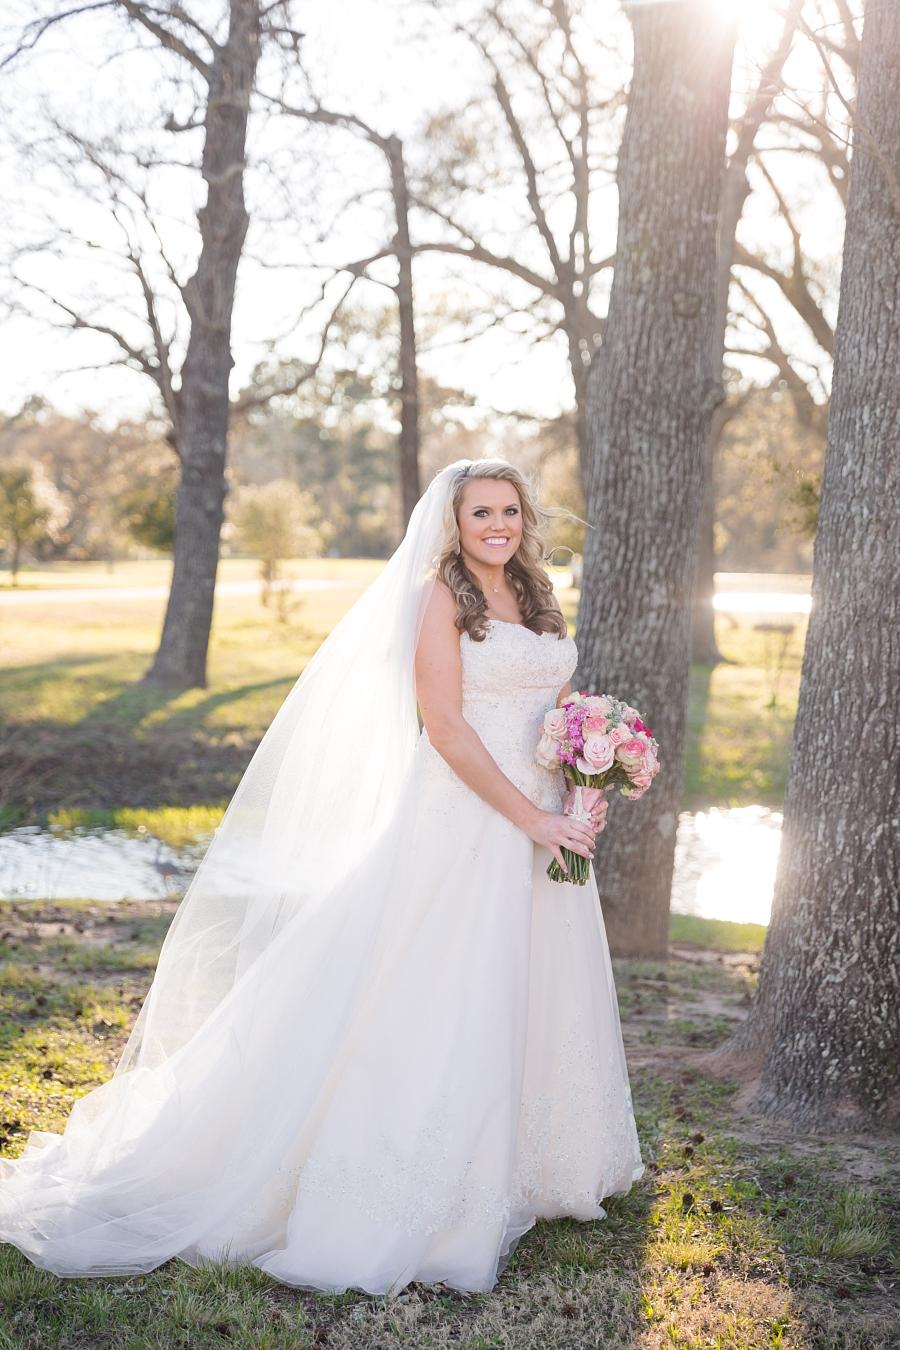 Stacy-Anderson-Photography-Balmorhea-Tomball-Wedding-Photographer_0008.jpg